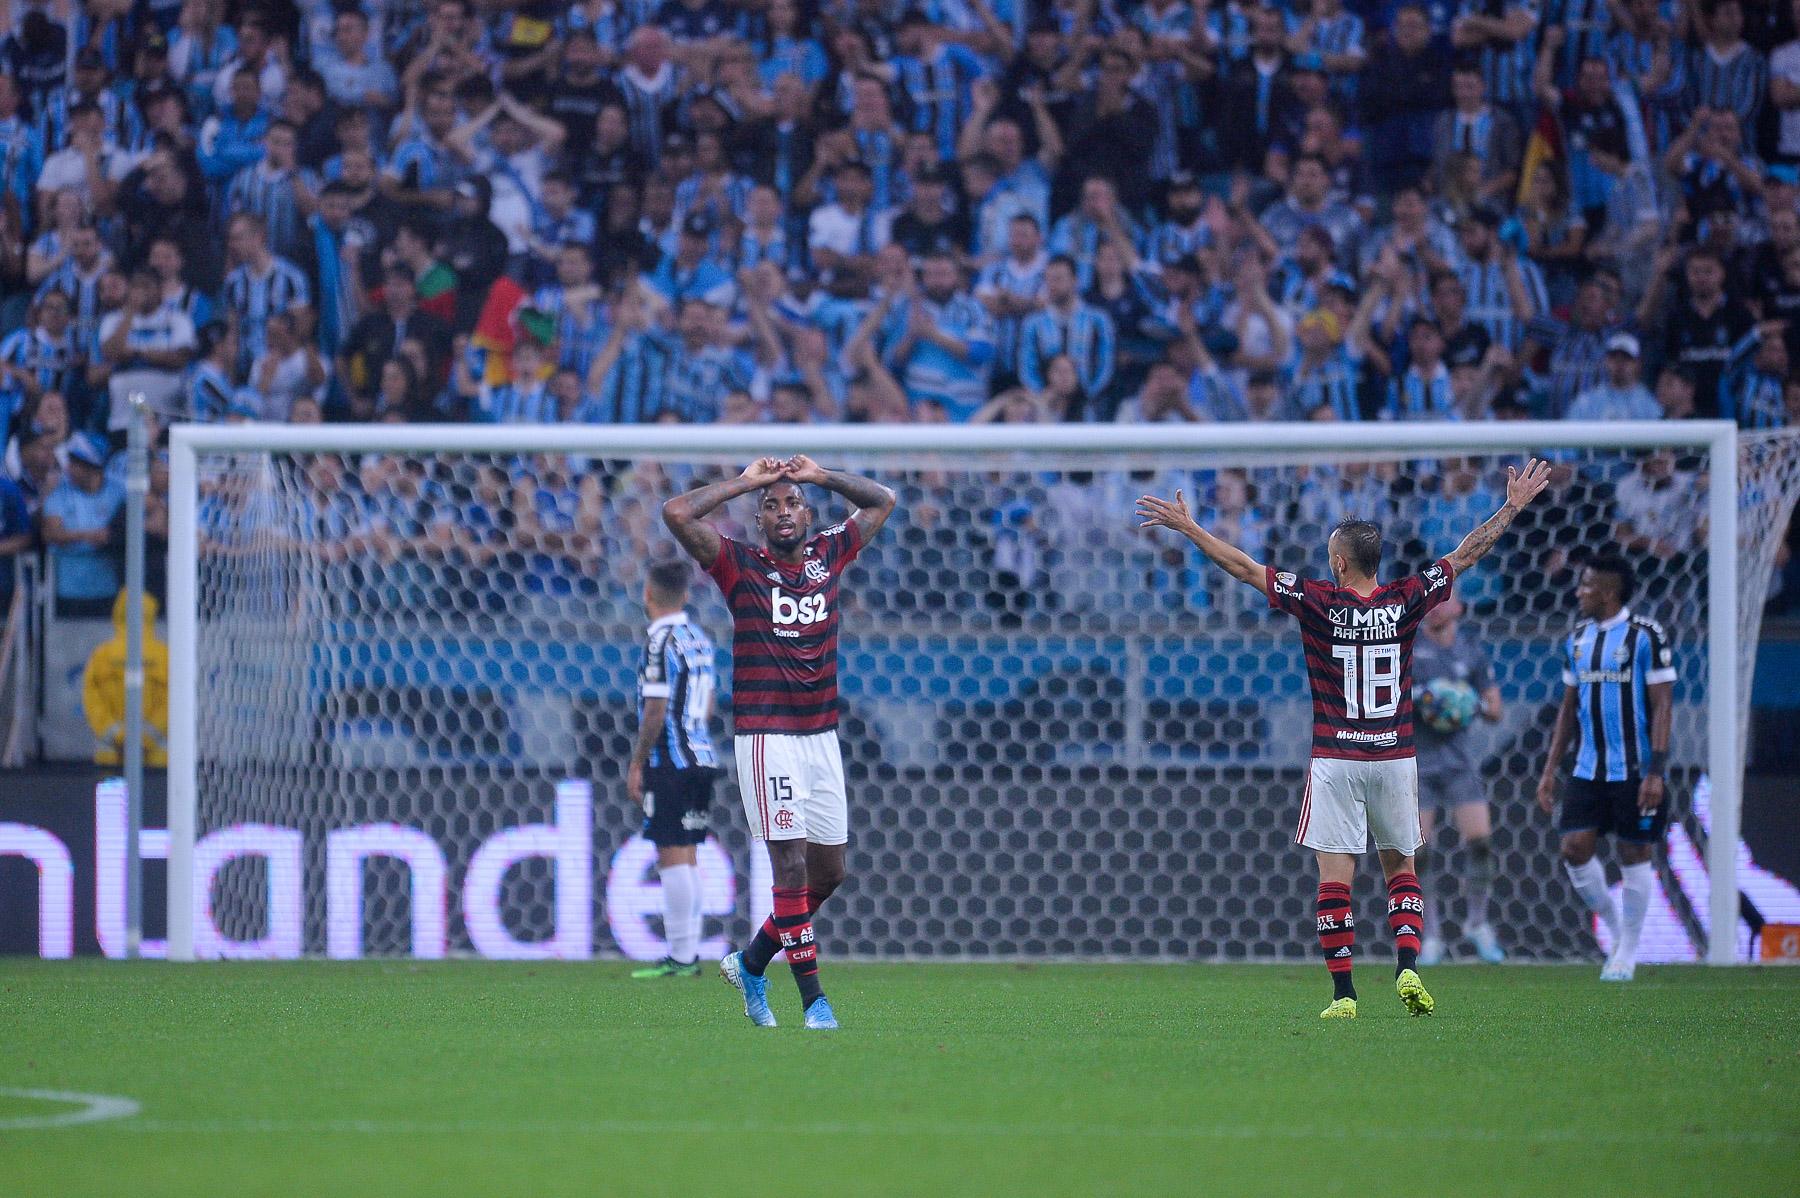 Gremio_X_Flamengo_dudabairros_Eleven_123